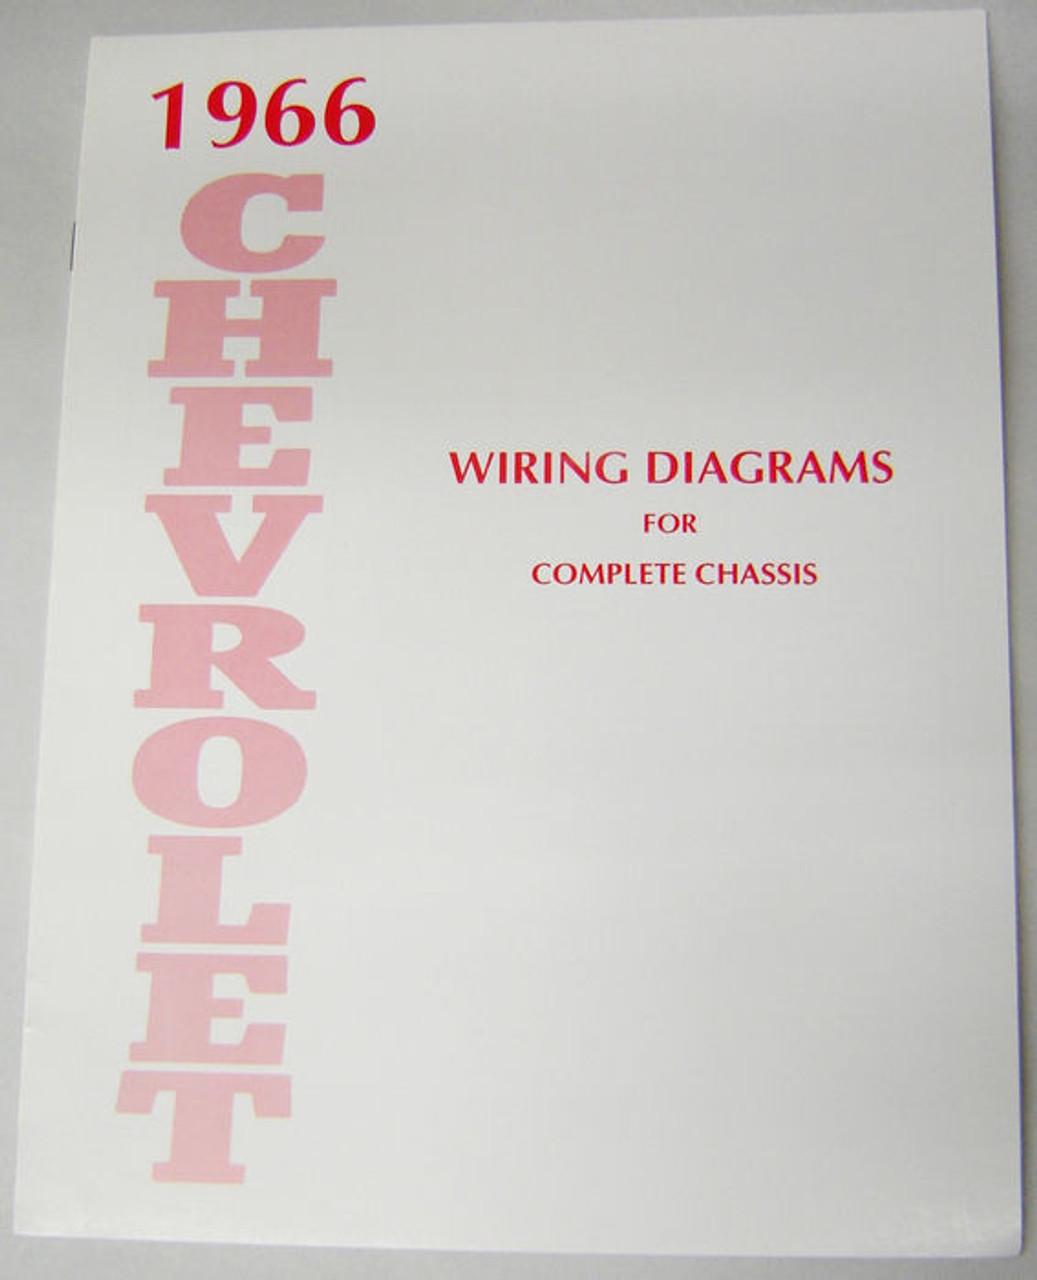 L1022_zpsjouiuker__97070.1443480941?c=2&imbypass=on 66 1966 chevy impala electrical wiring diagram manual i 5